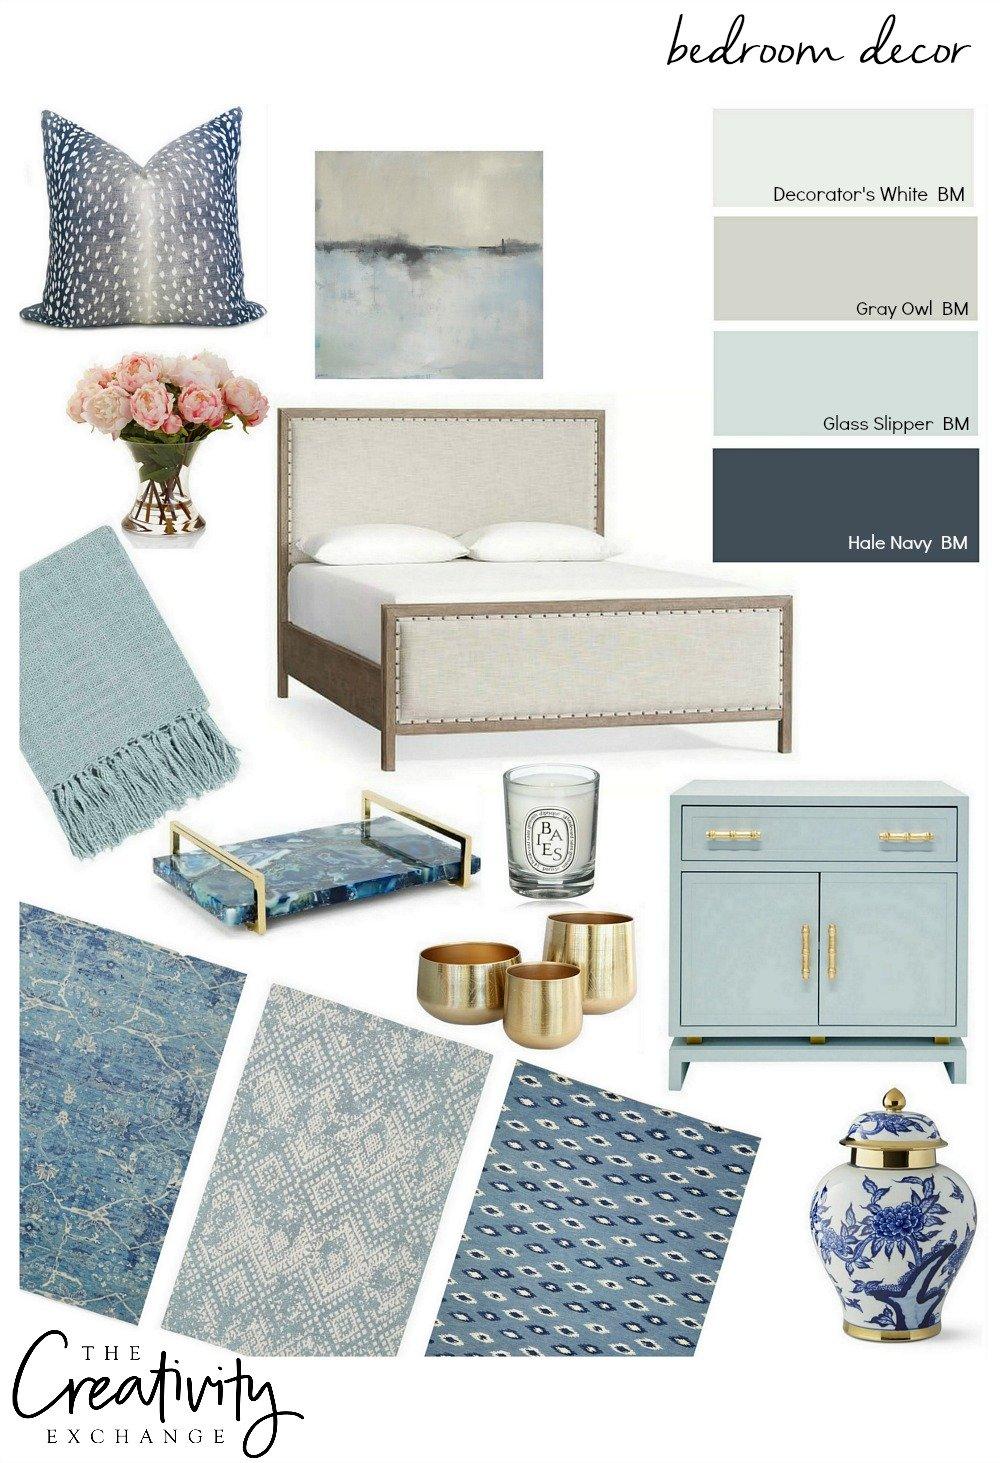 Bedroom Decor Ideas with Design Board